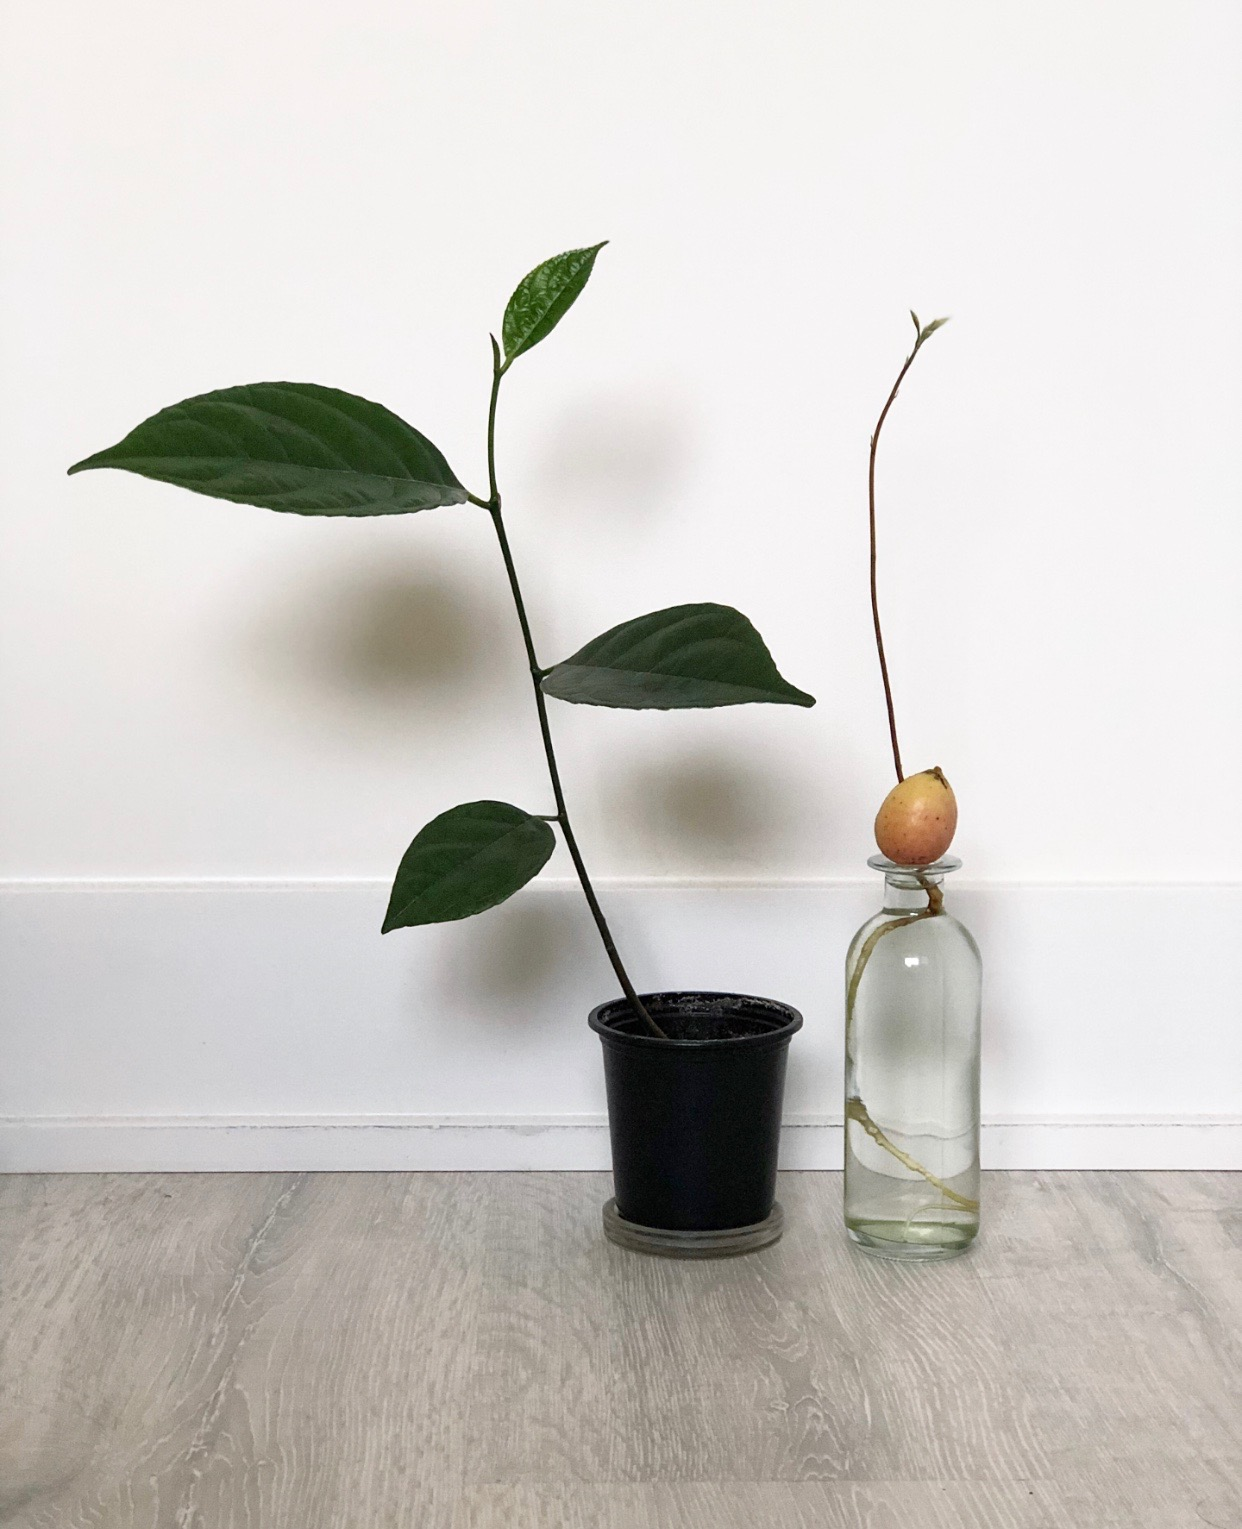 046  avocado seed germination – lostinplantopia